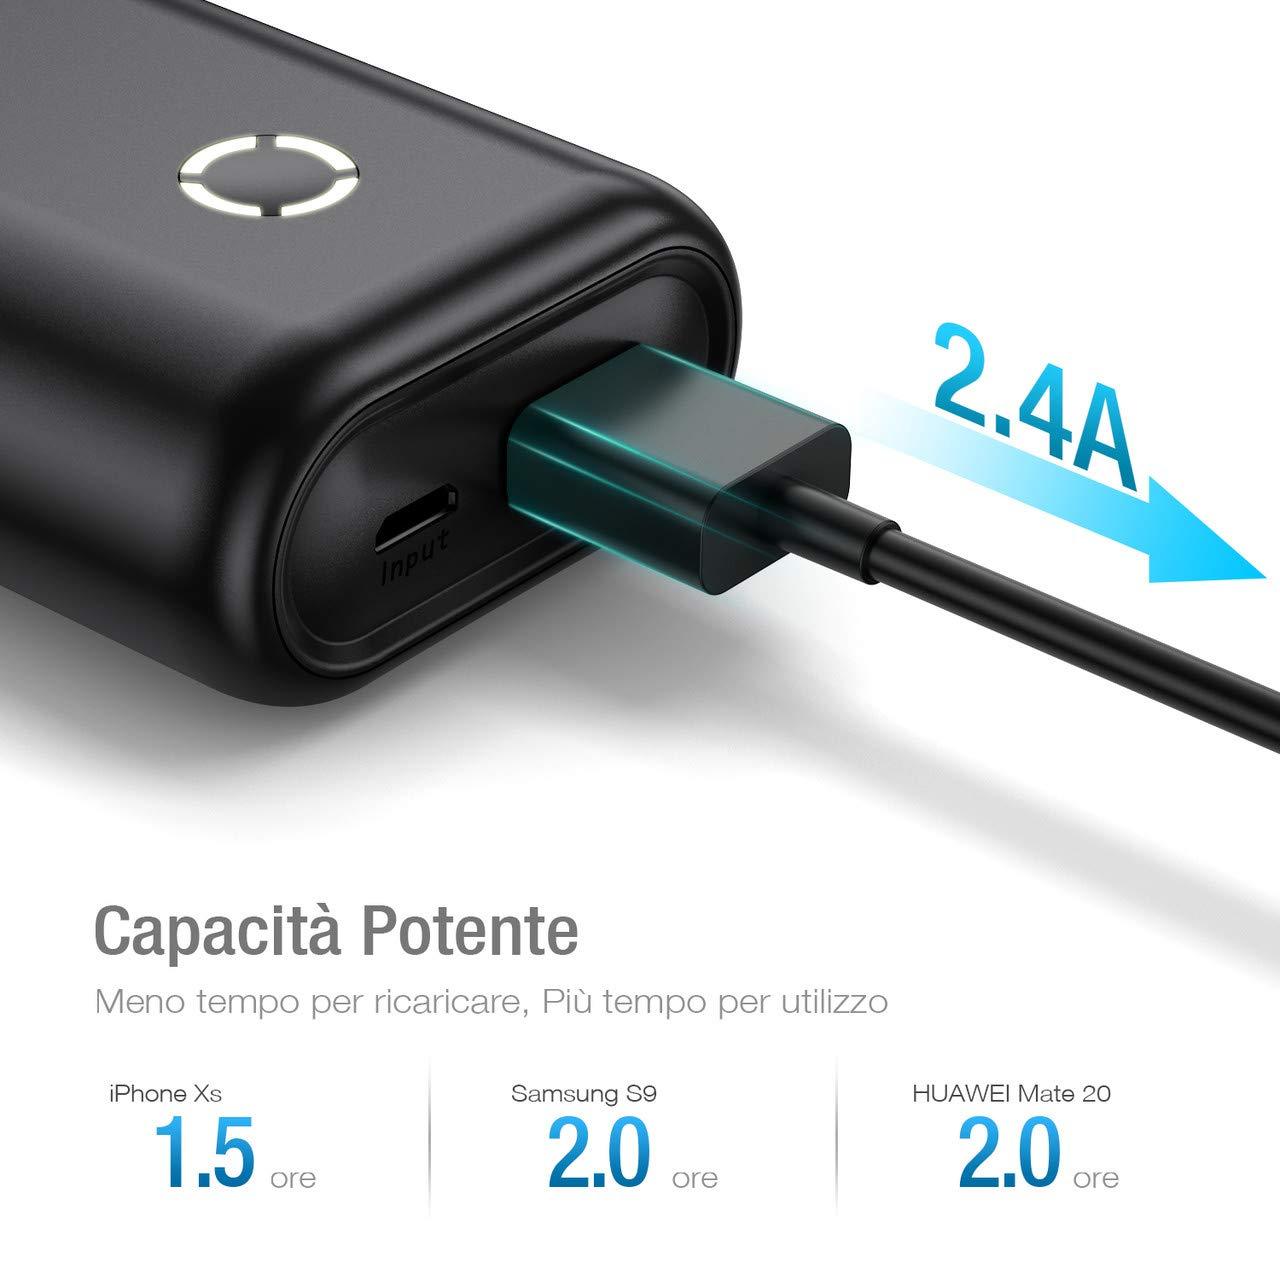 POWERADD EnergyCell Caricatore Portatile 10000mAh powerbank Output da 2.4A Portatile Caricabatterie per Huawei, Samsung, iPhone, Xiaomi - (Un Cavo Micro USB)